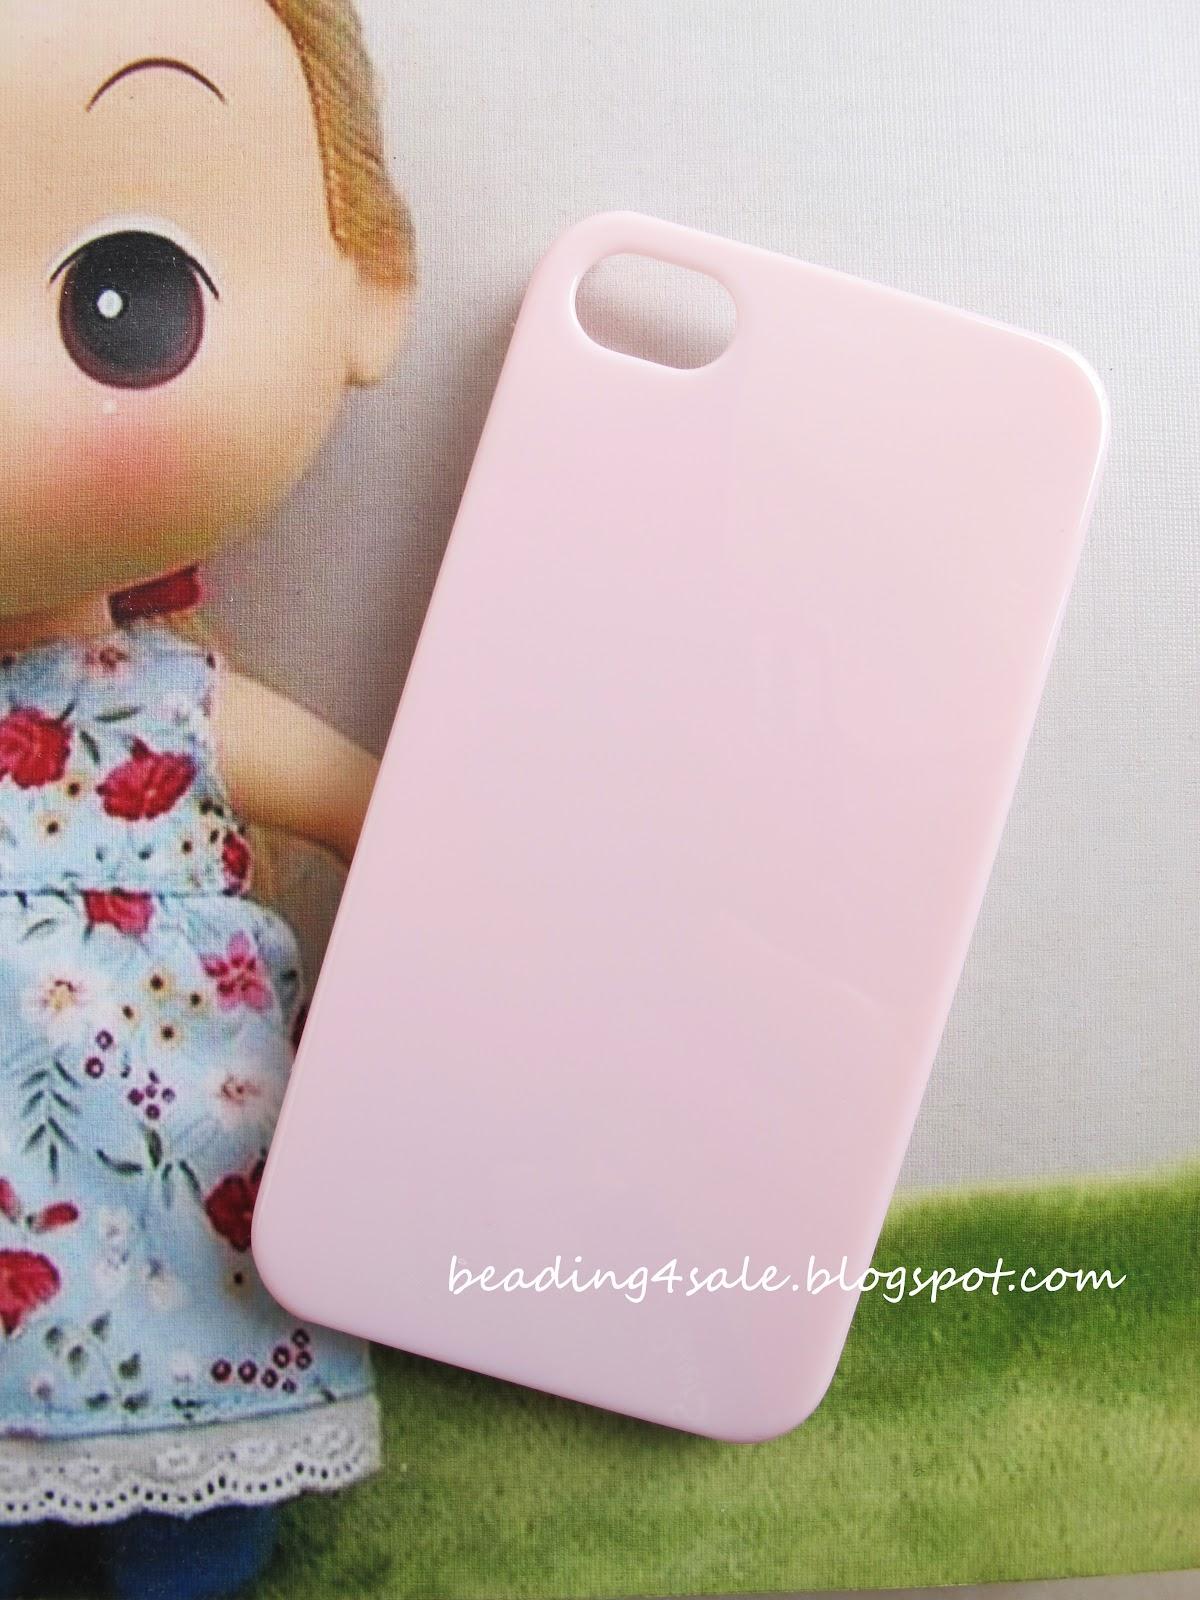 http://4.bp.blogspot.com/-MDpSY3XtF6k/T_f0BuTNSdI/AAAAAAAAIZk/dQEMZU37-jo/s1600/Phonecover_IceCream_LightPink.jpg